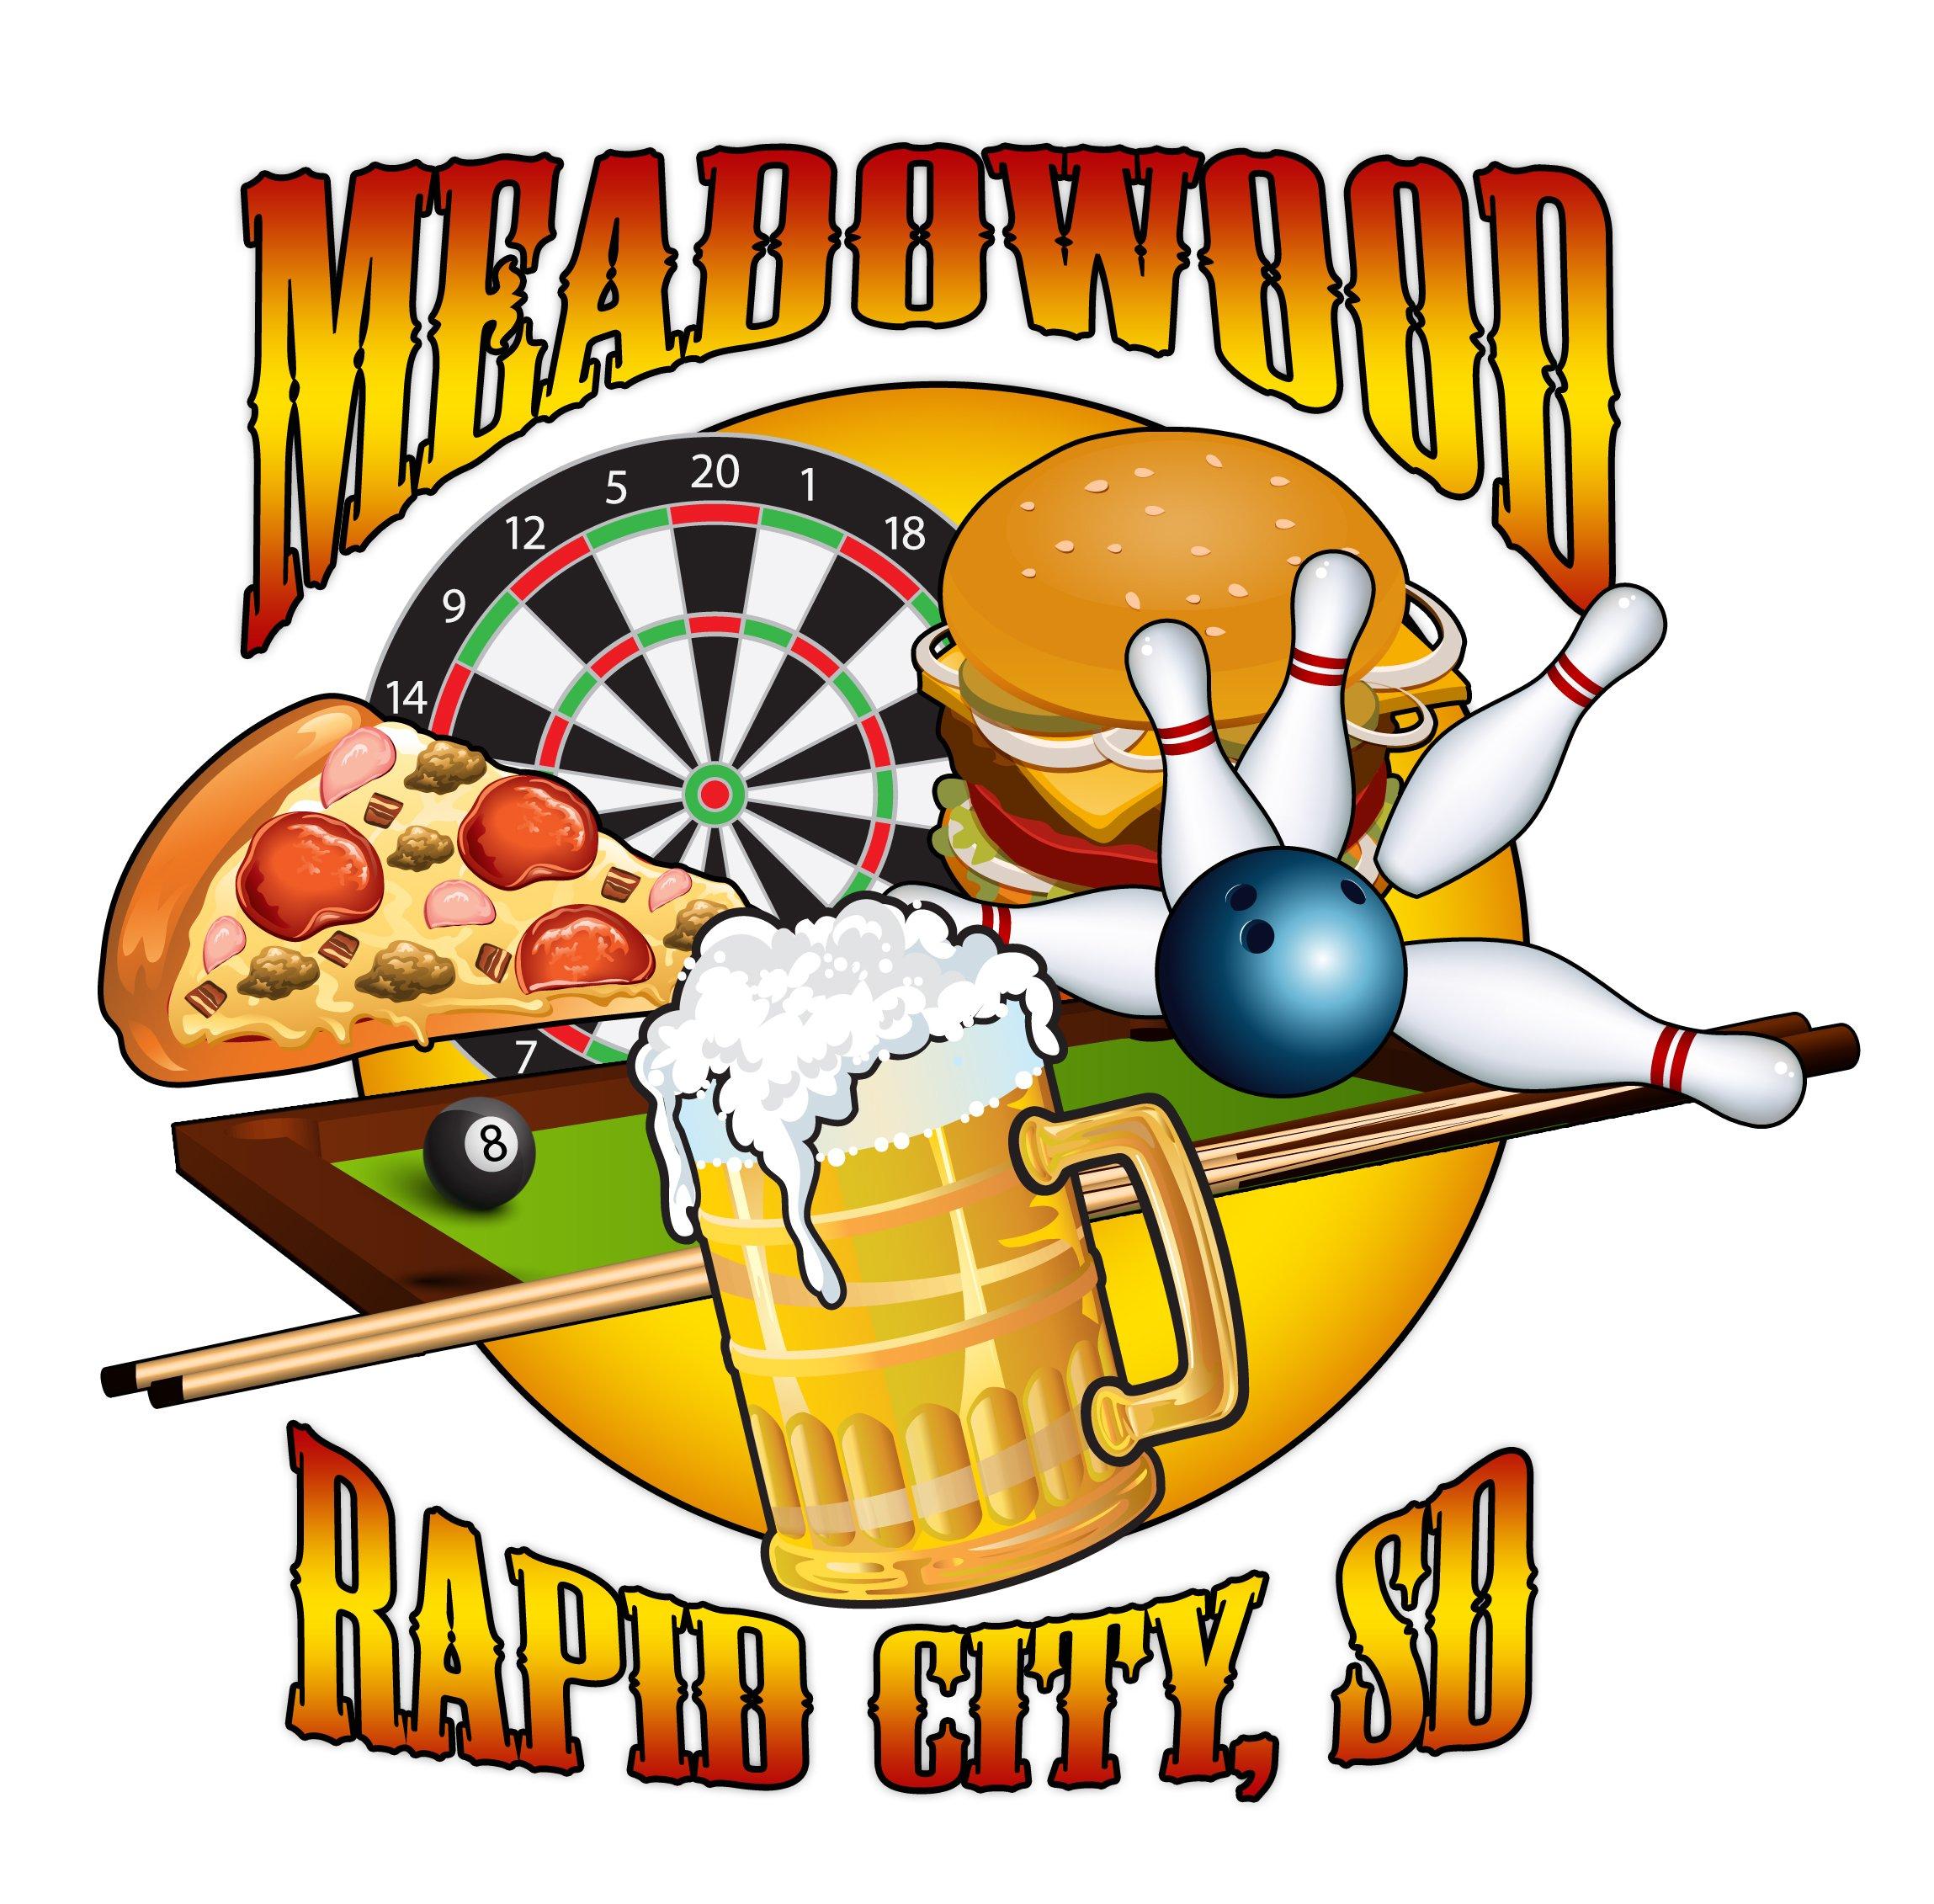 Meadowood Bowling Lanes